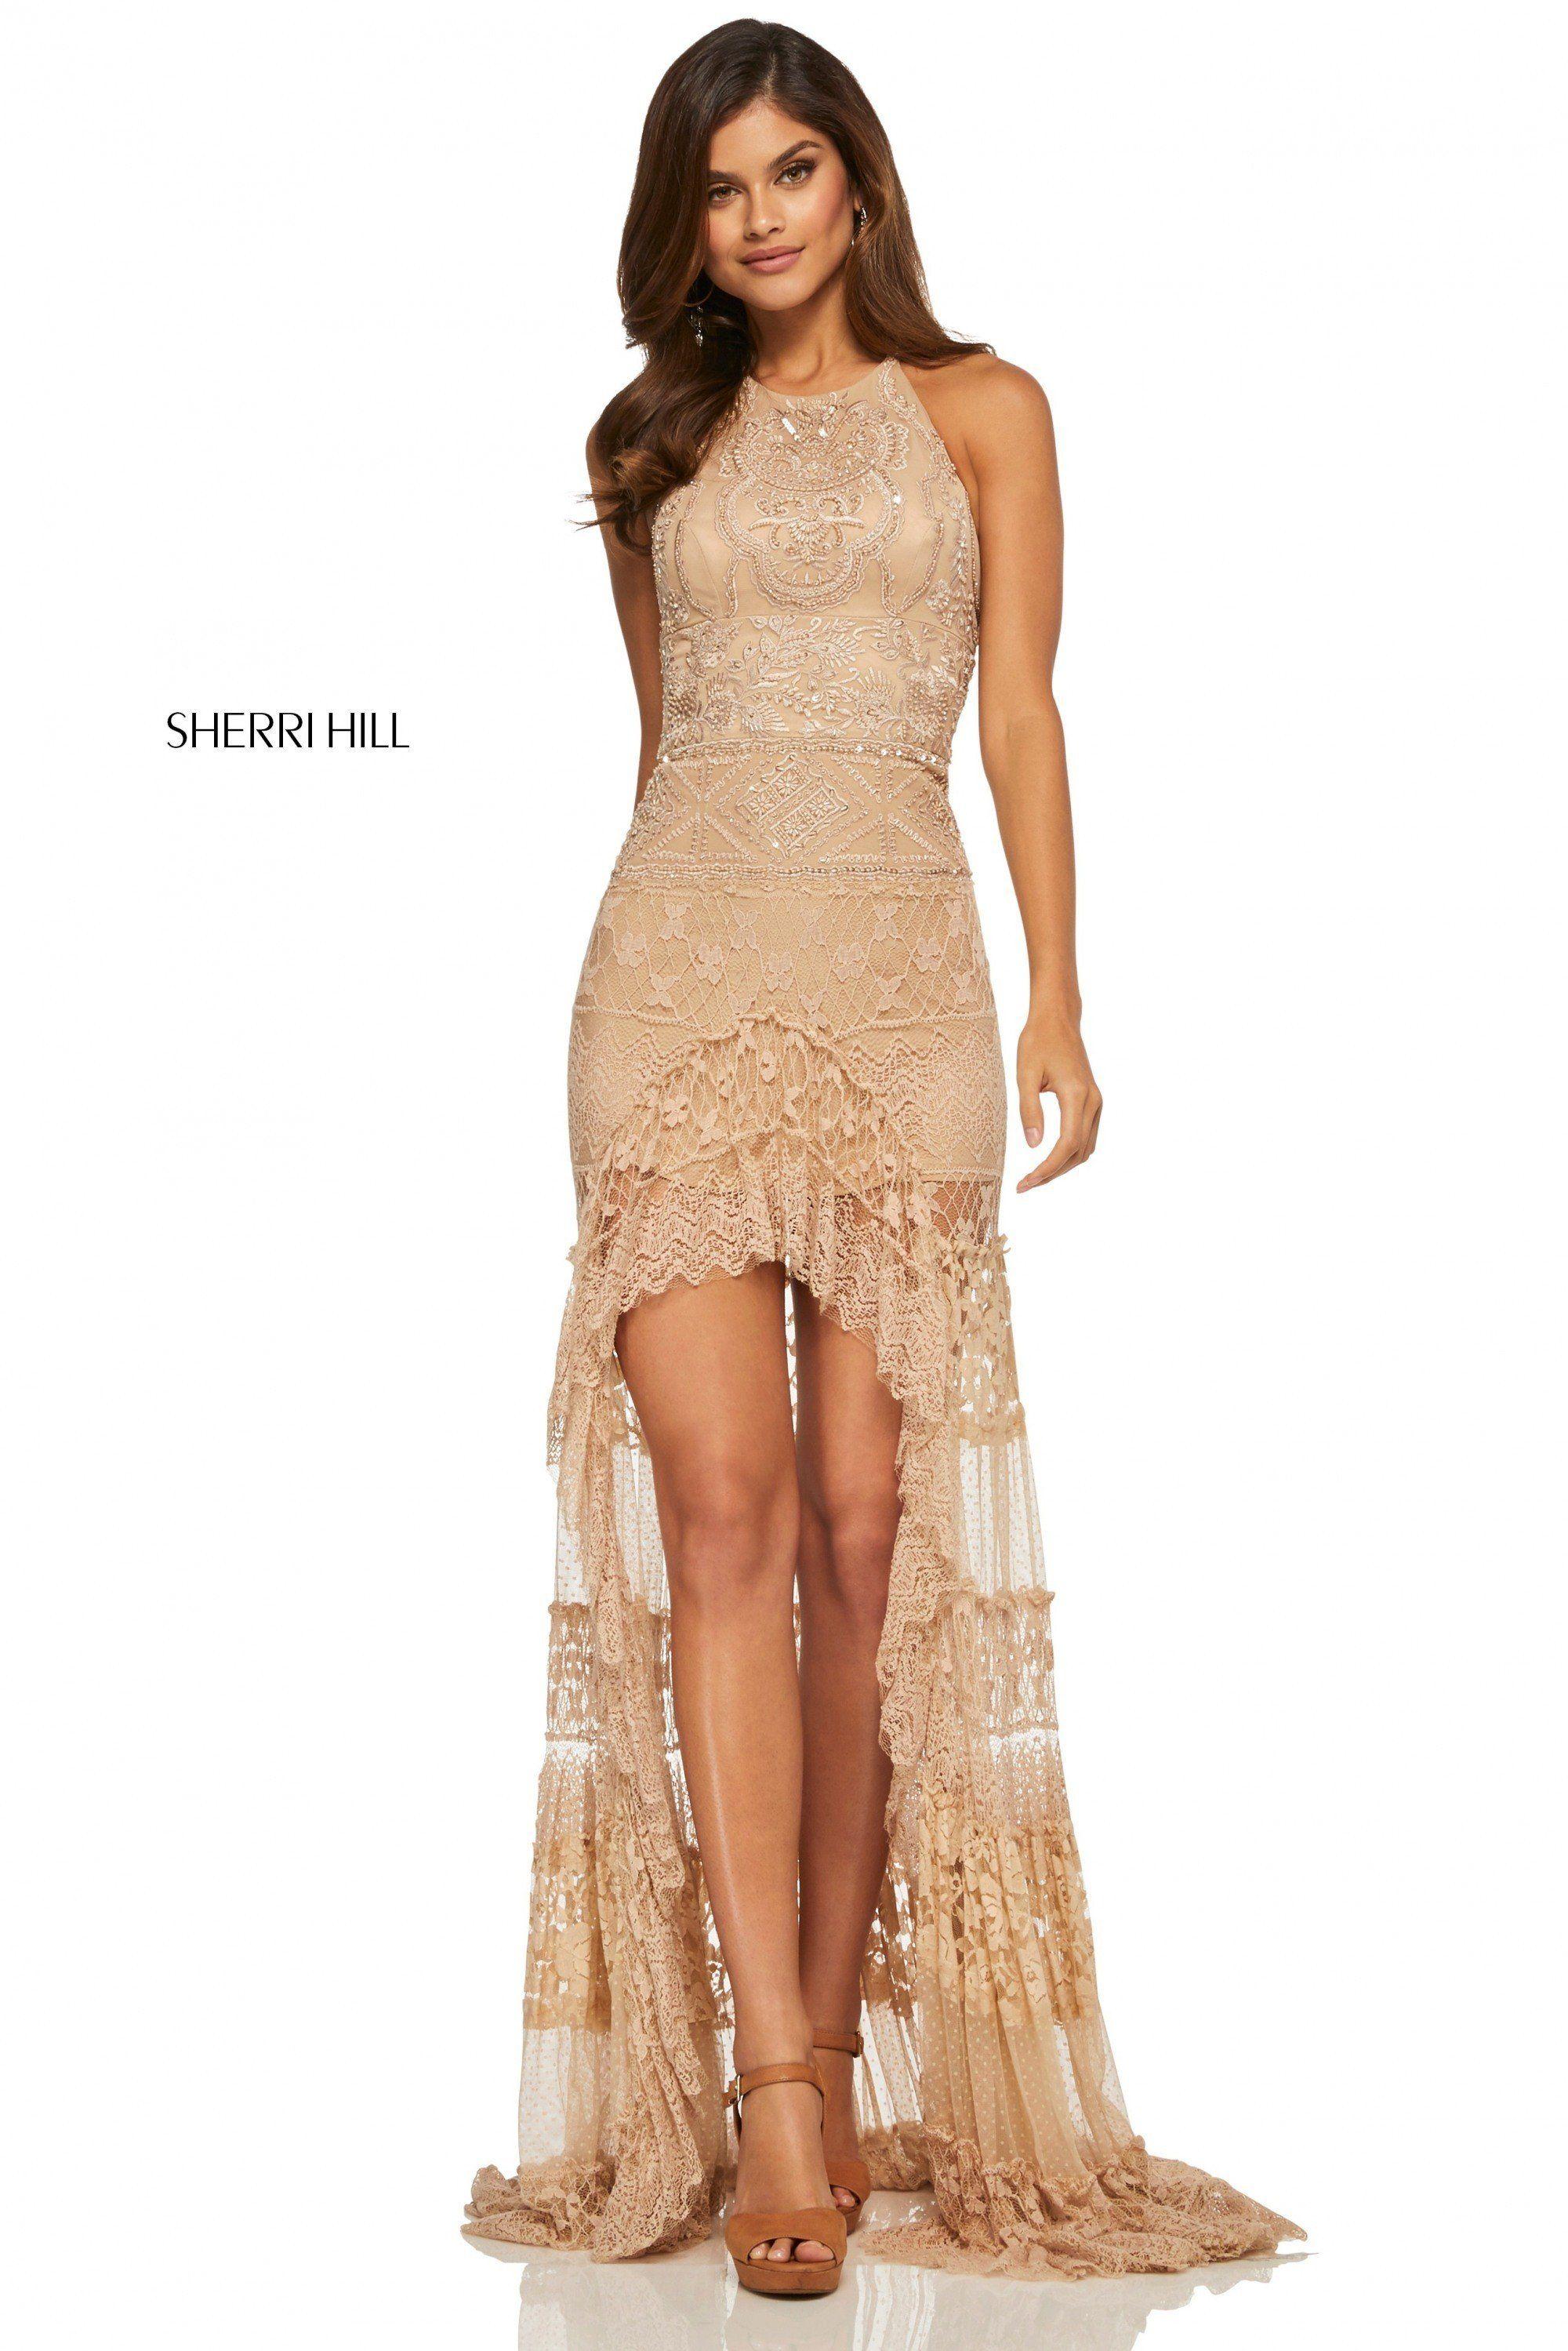 Photo of Sherri Hill 52663 Lace High-Low Dress